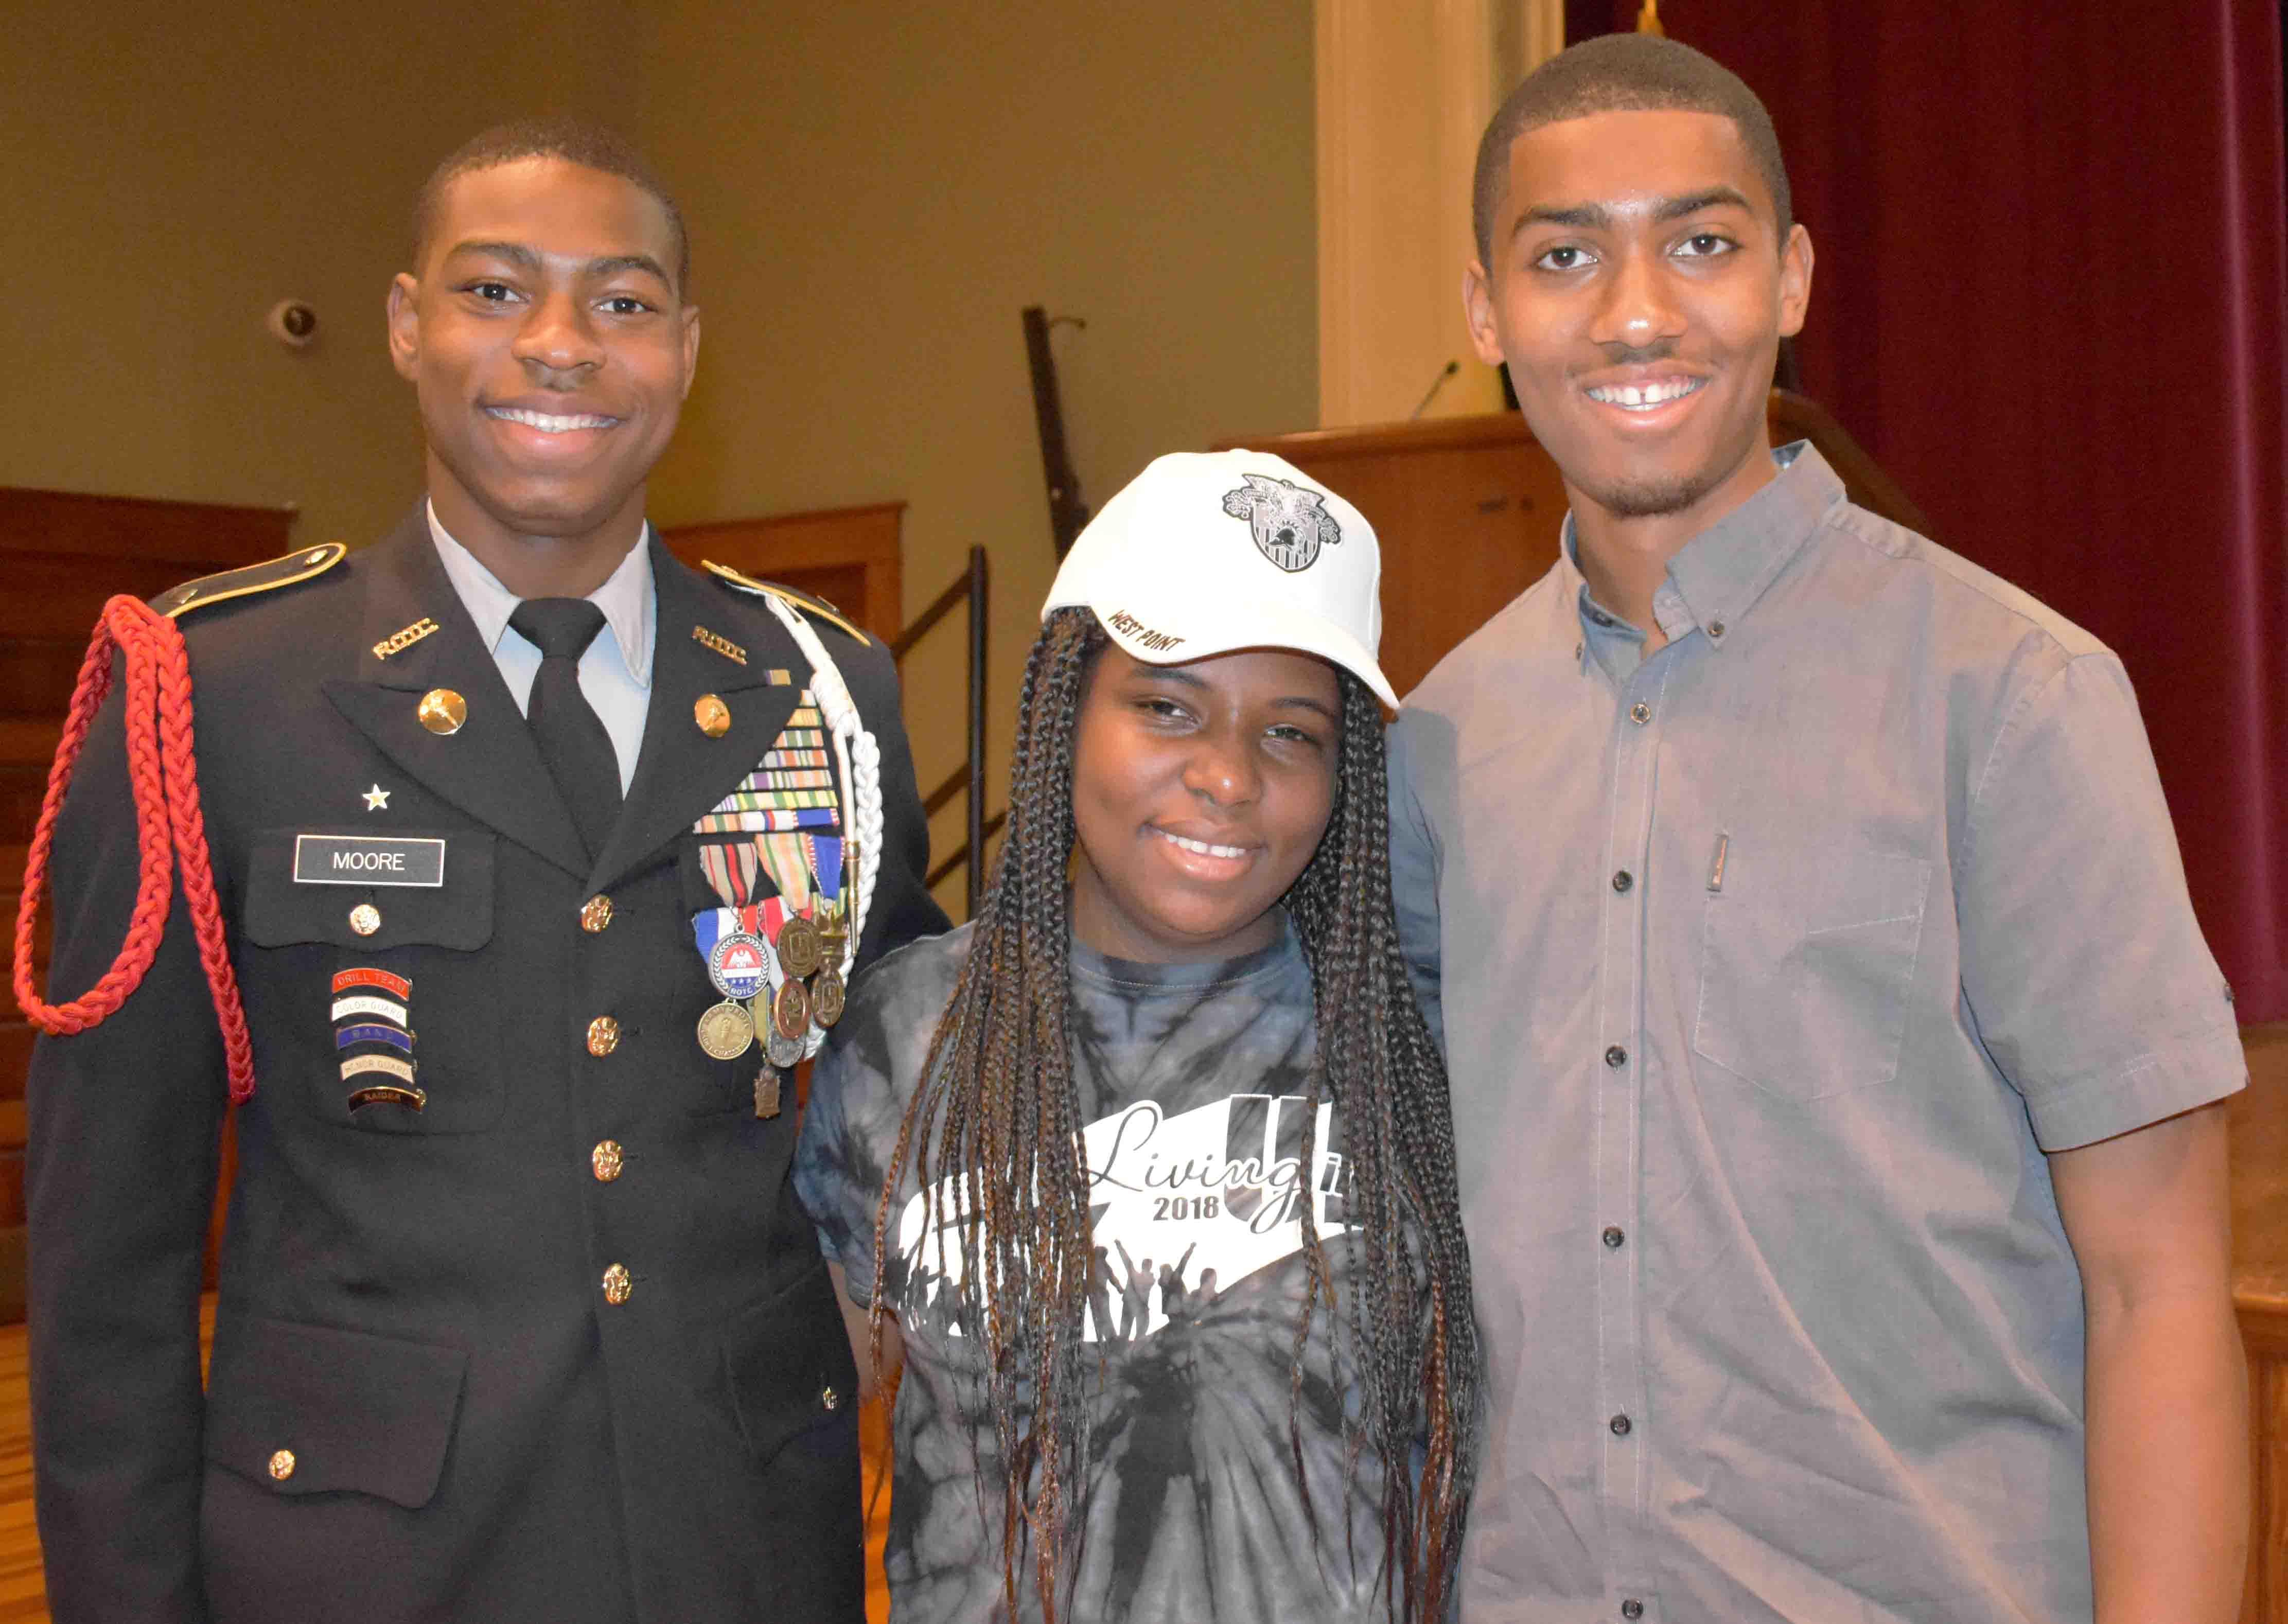 Daniel Moore (Pine Bluff), Kennedy Morris, Caleb Williams